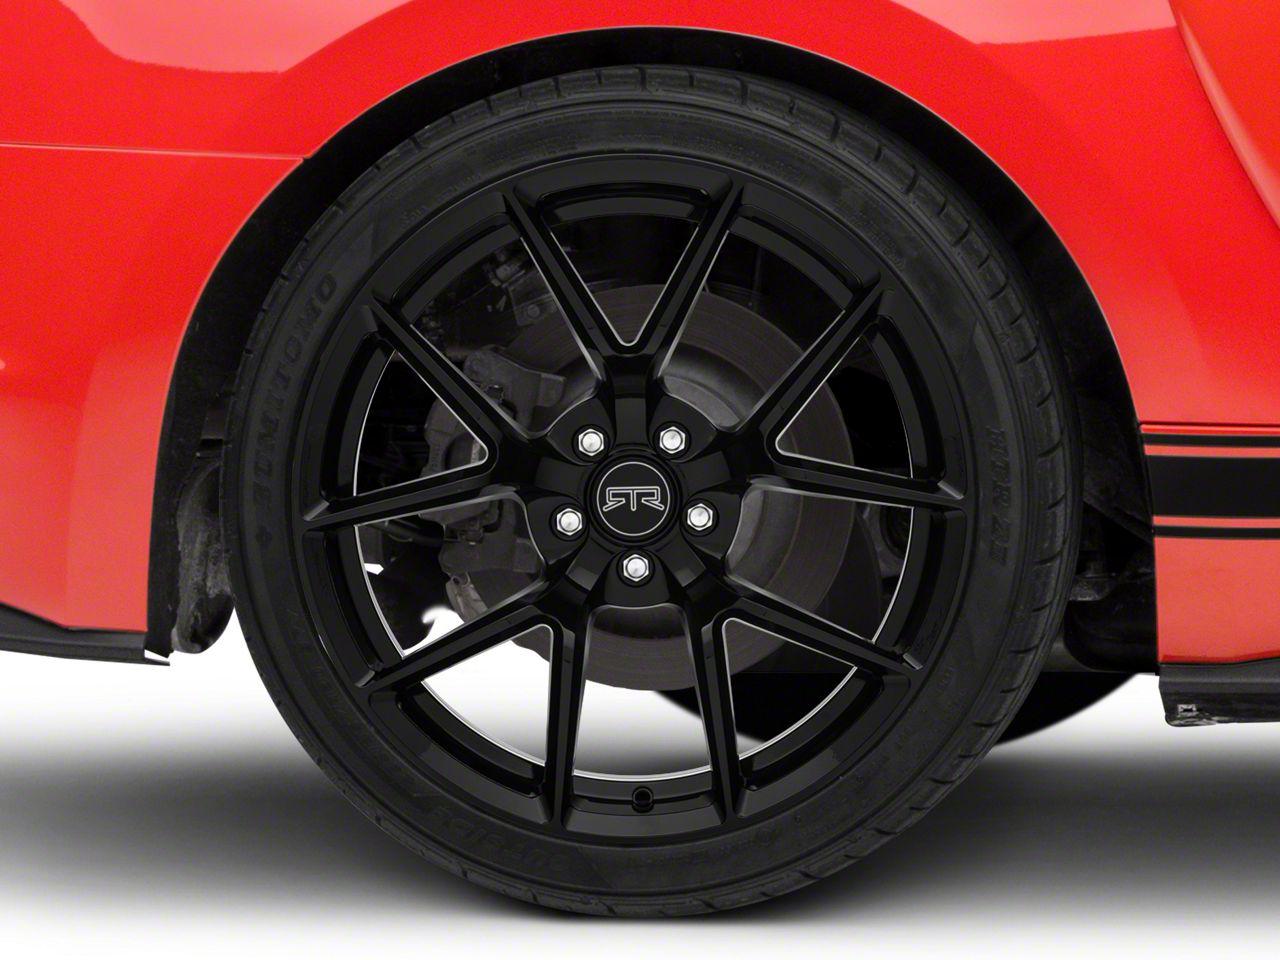 RTR Tech 5 Black Wheel - 20x10.5 - Rear Only (15-19 All)